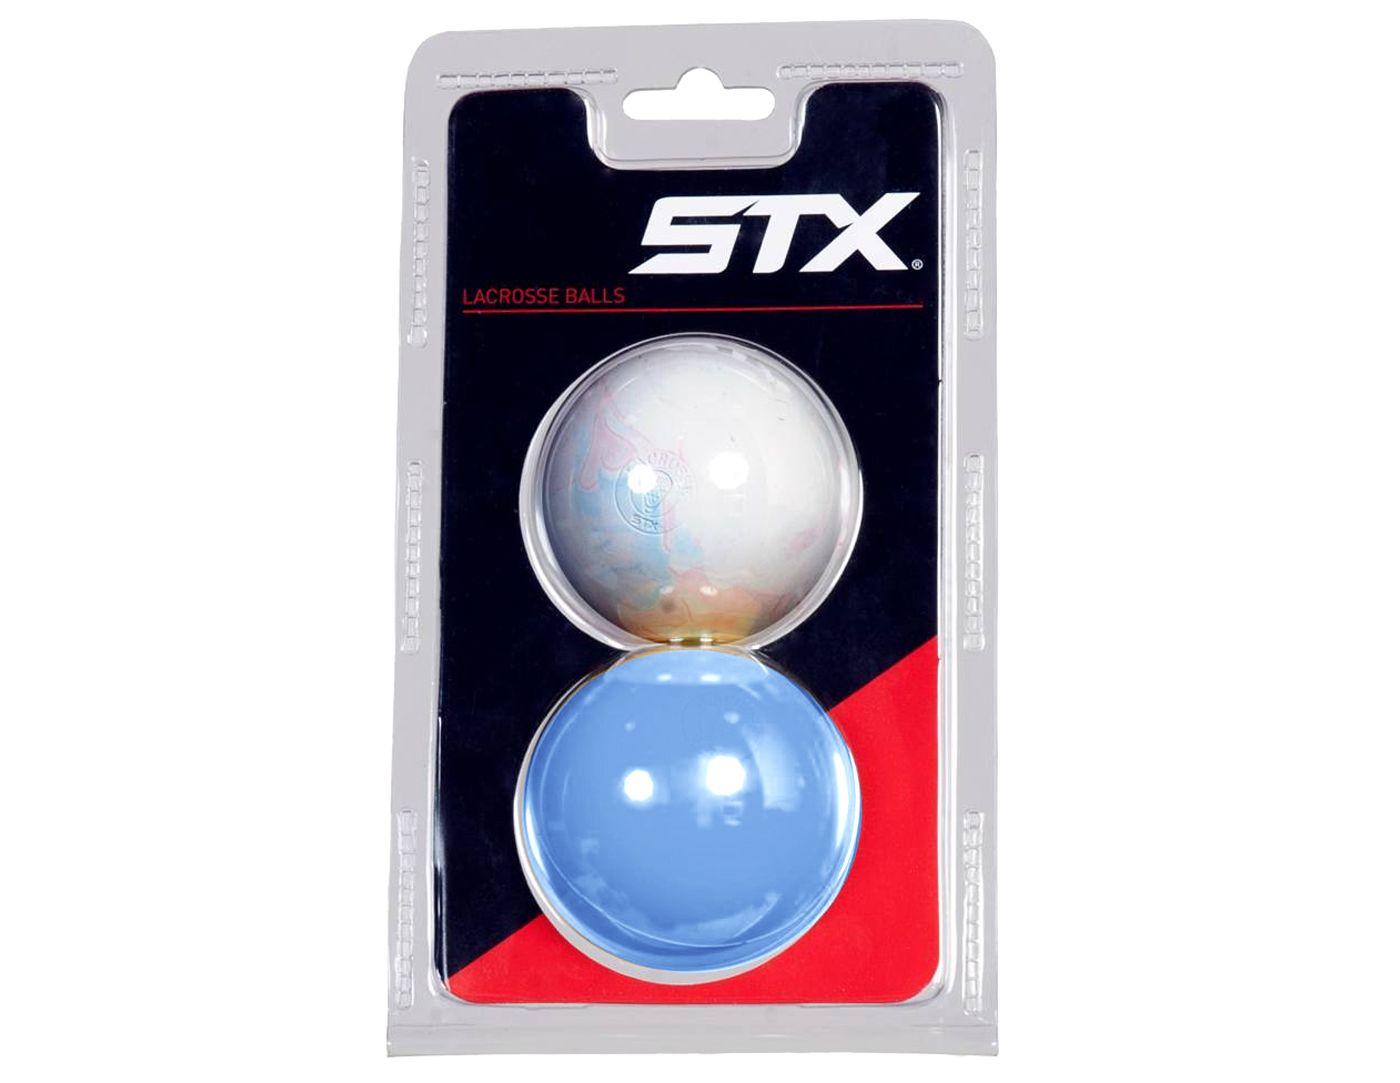 STX Marble Lacrosse Balls - 2 Pack